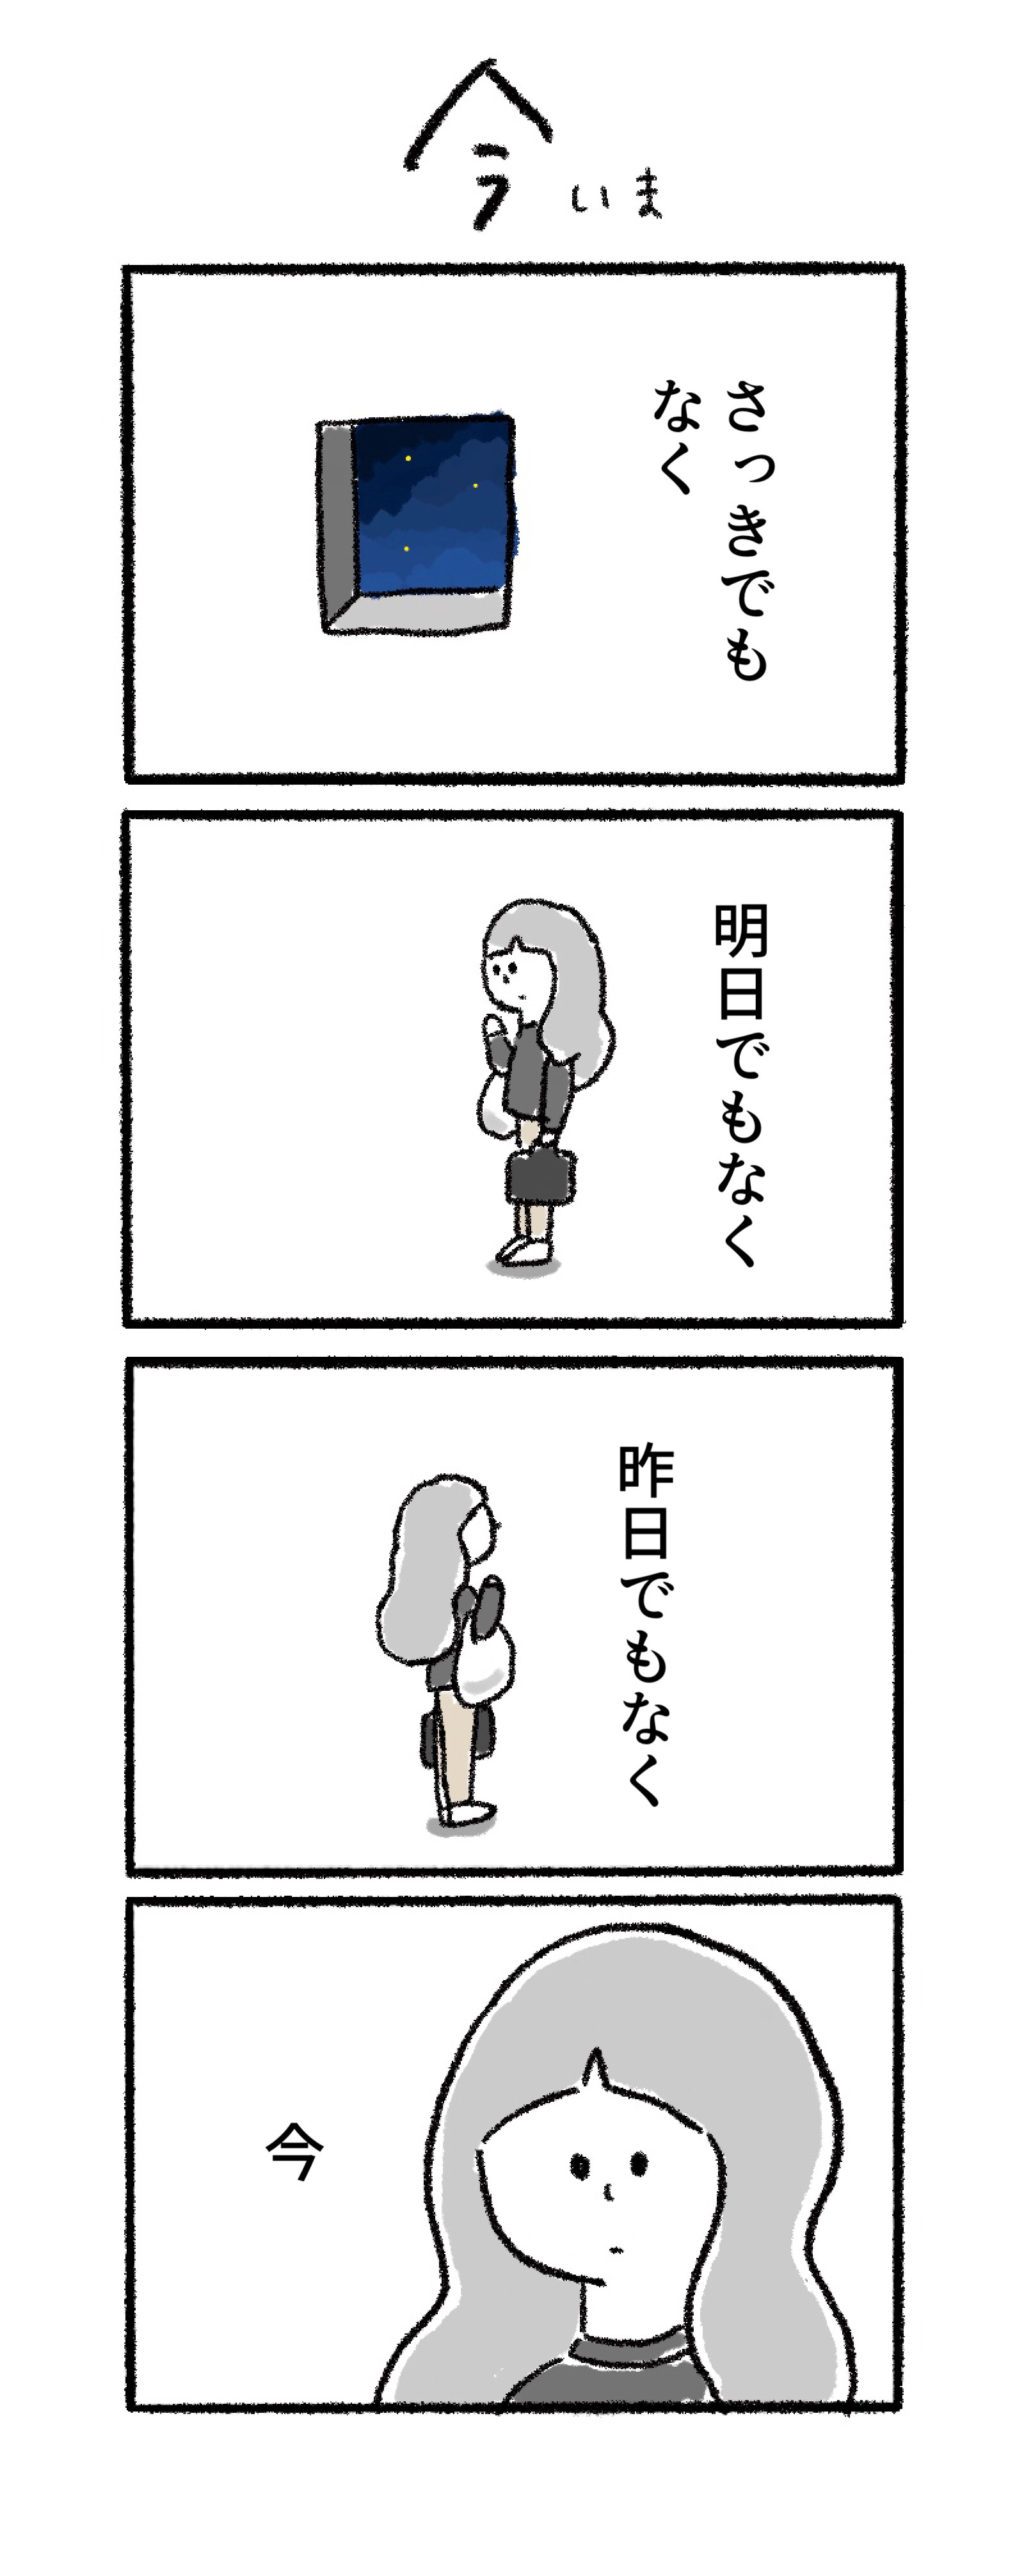 4koma 四コマ漫画 よんこま 漫画